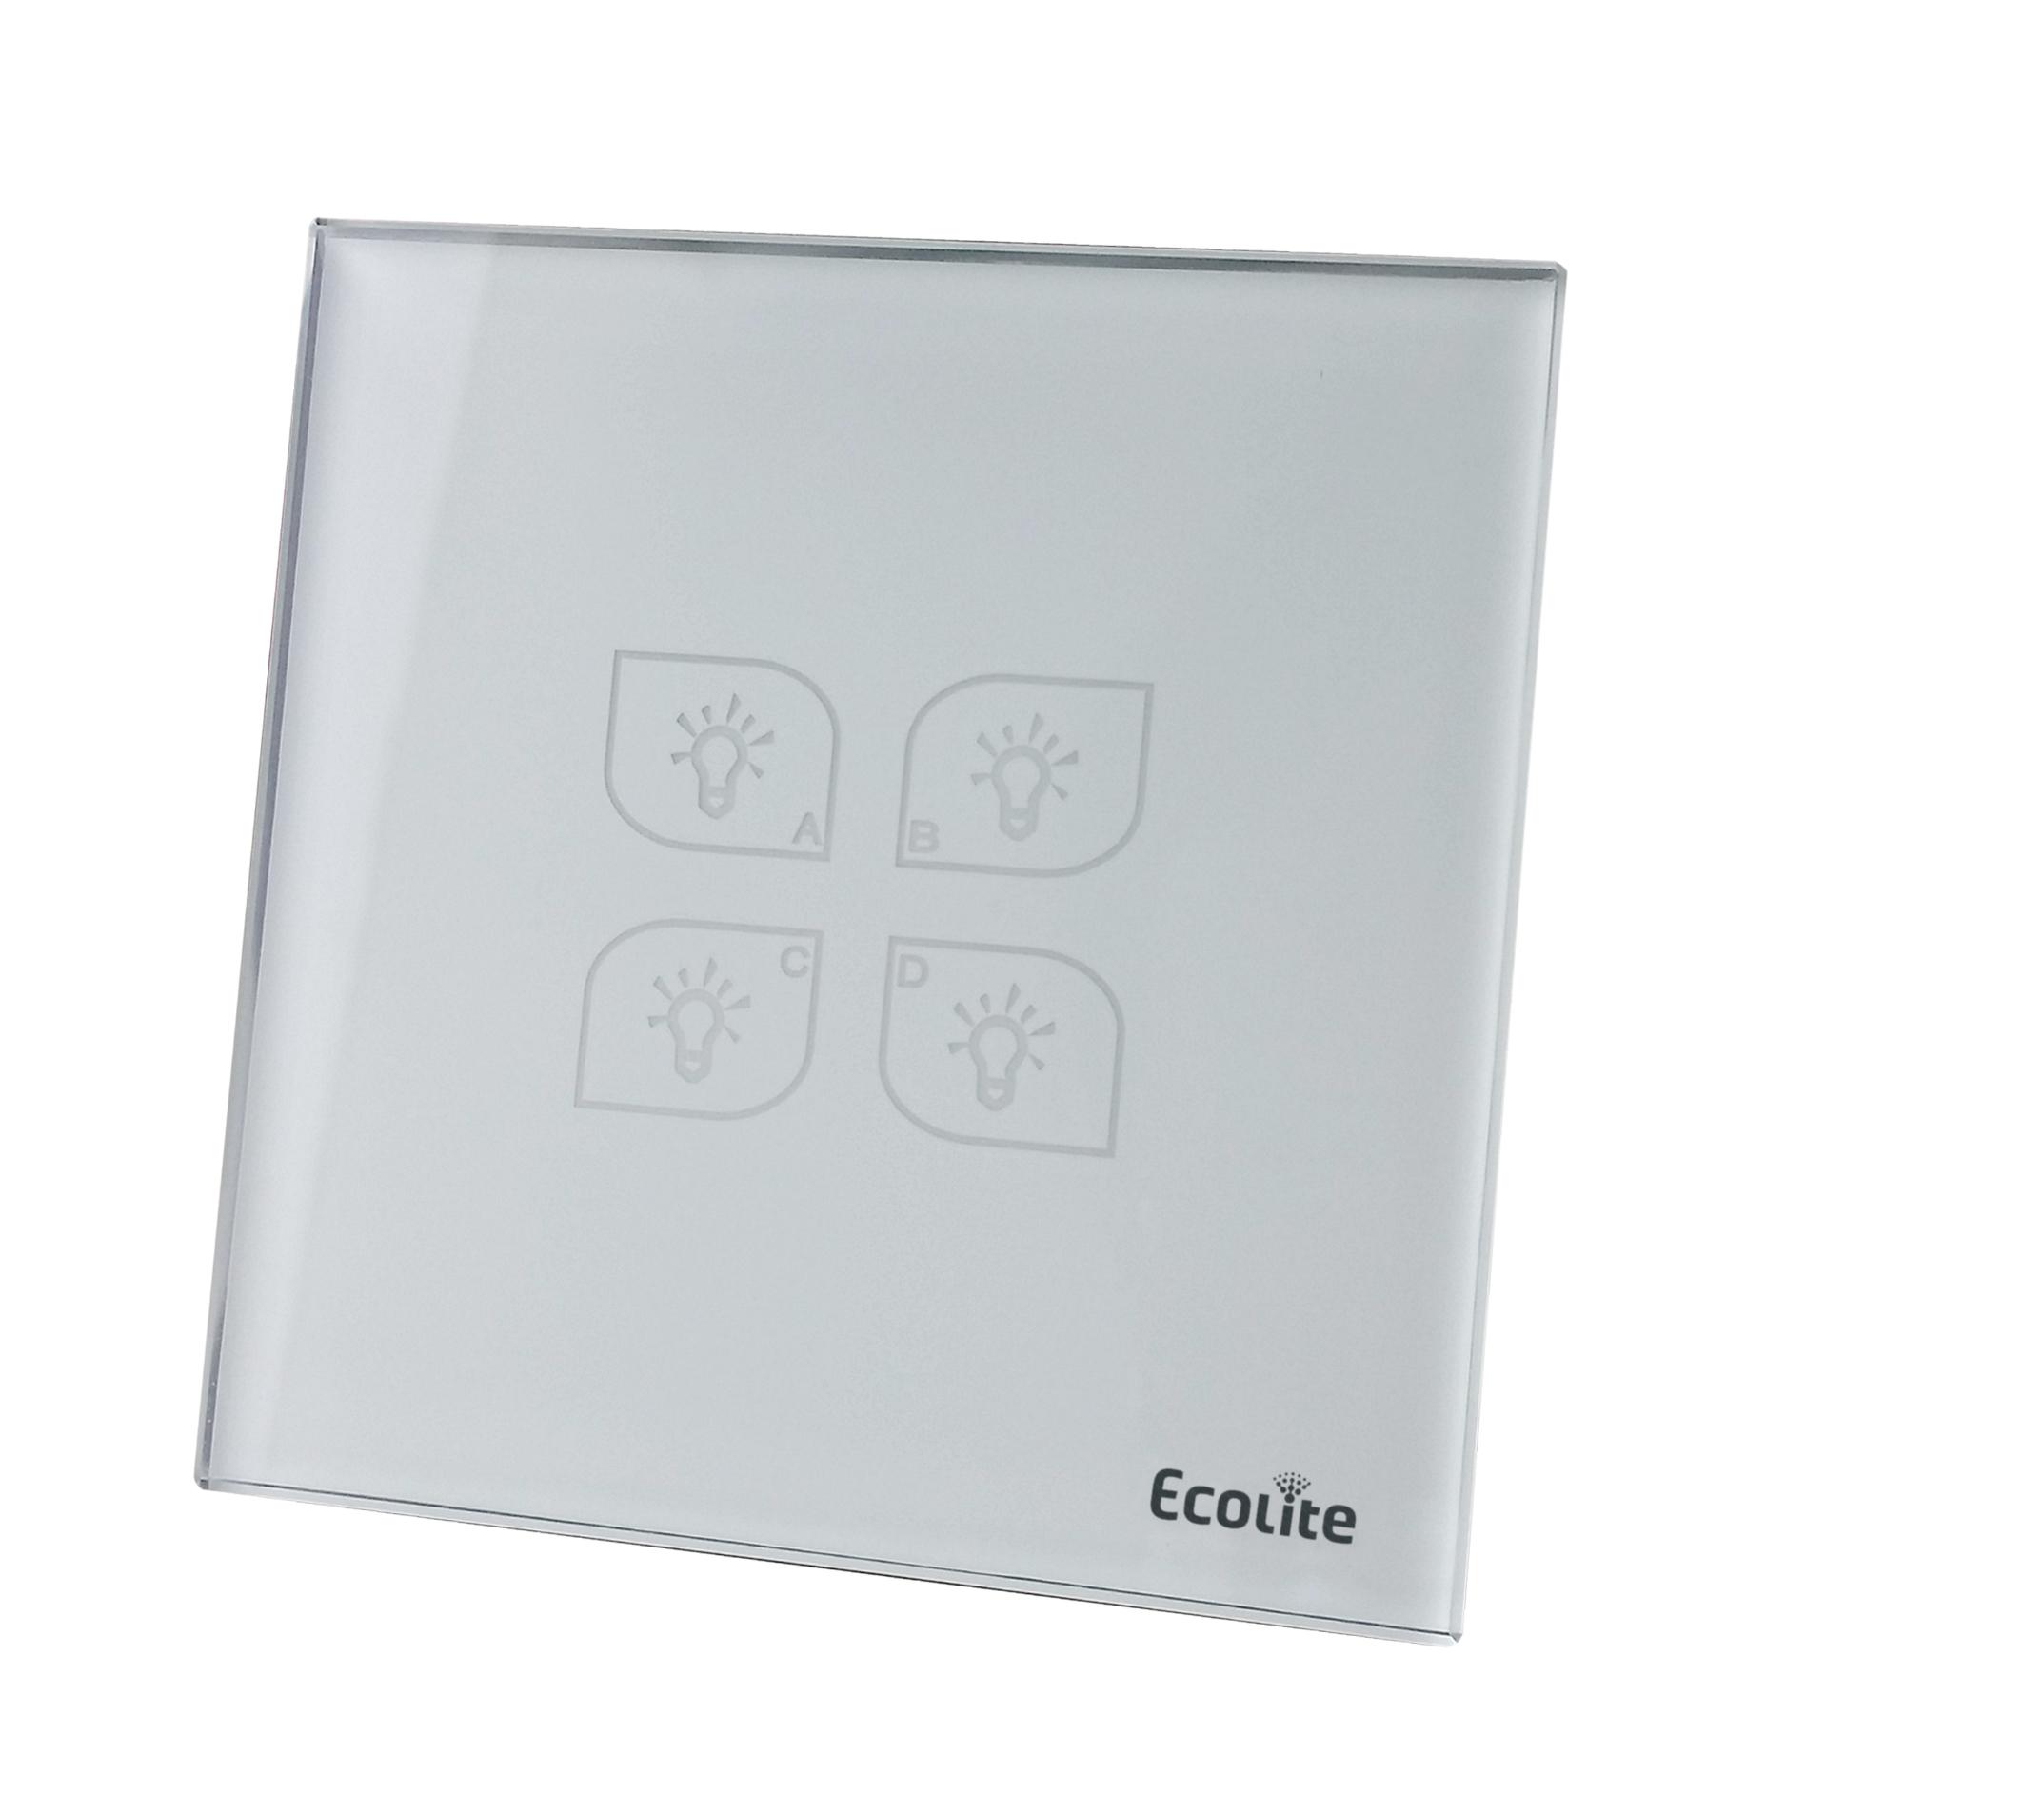 Smart lighting four-button panel